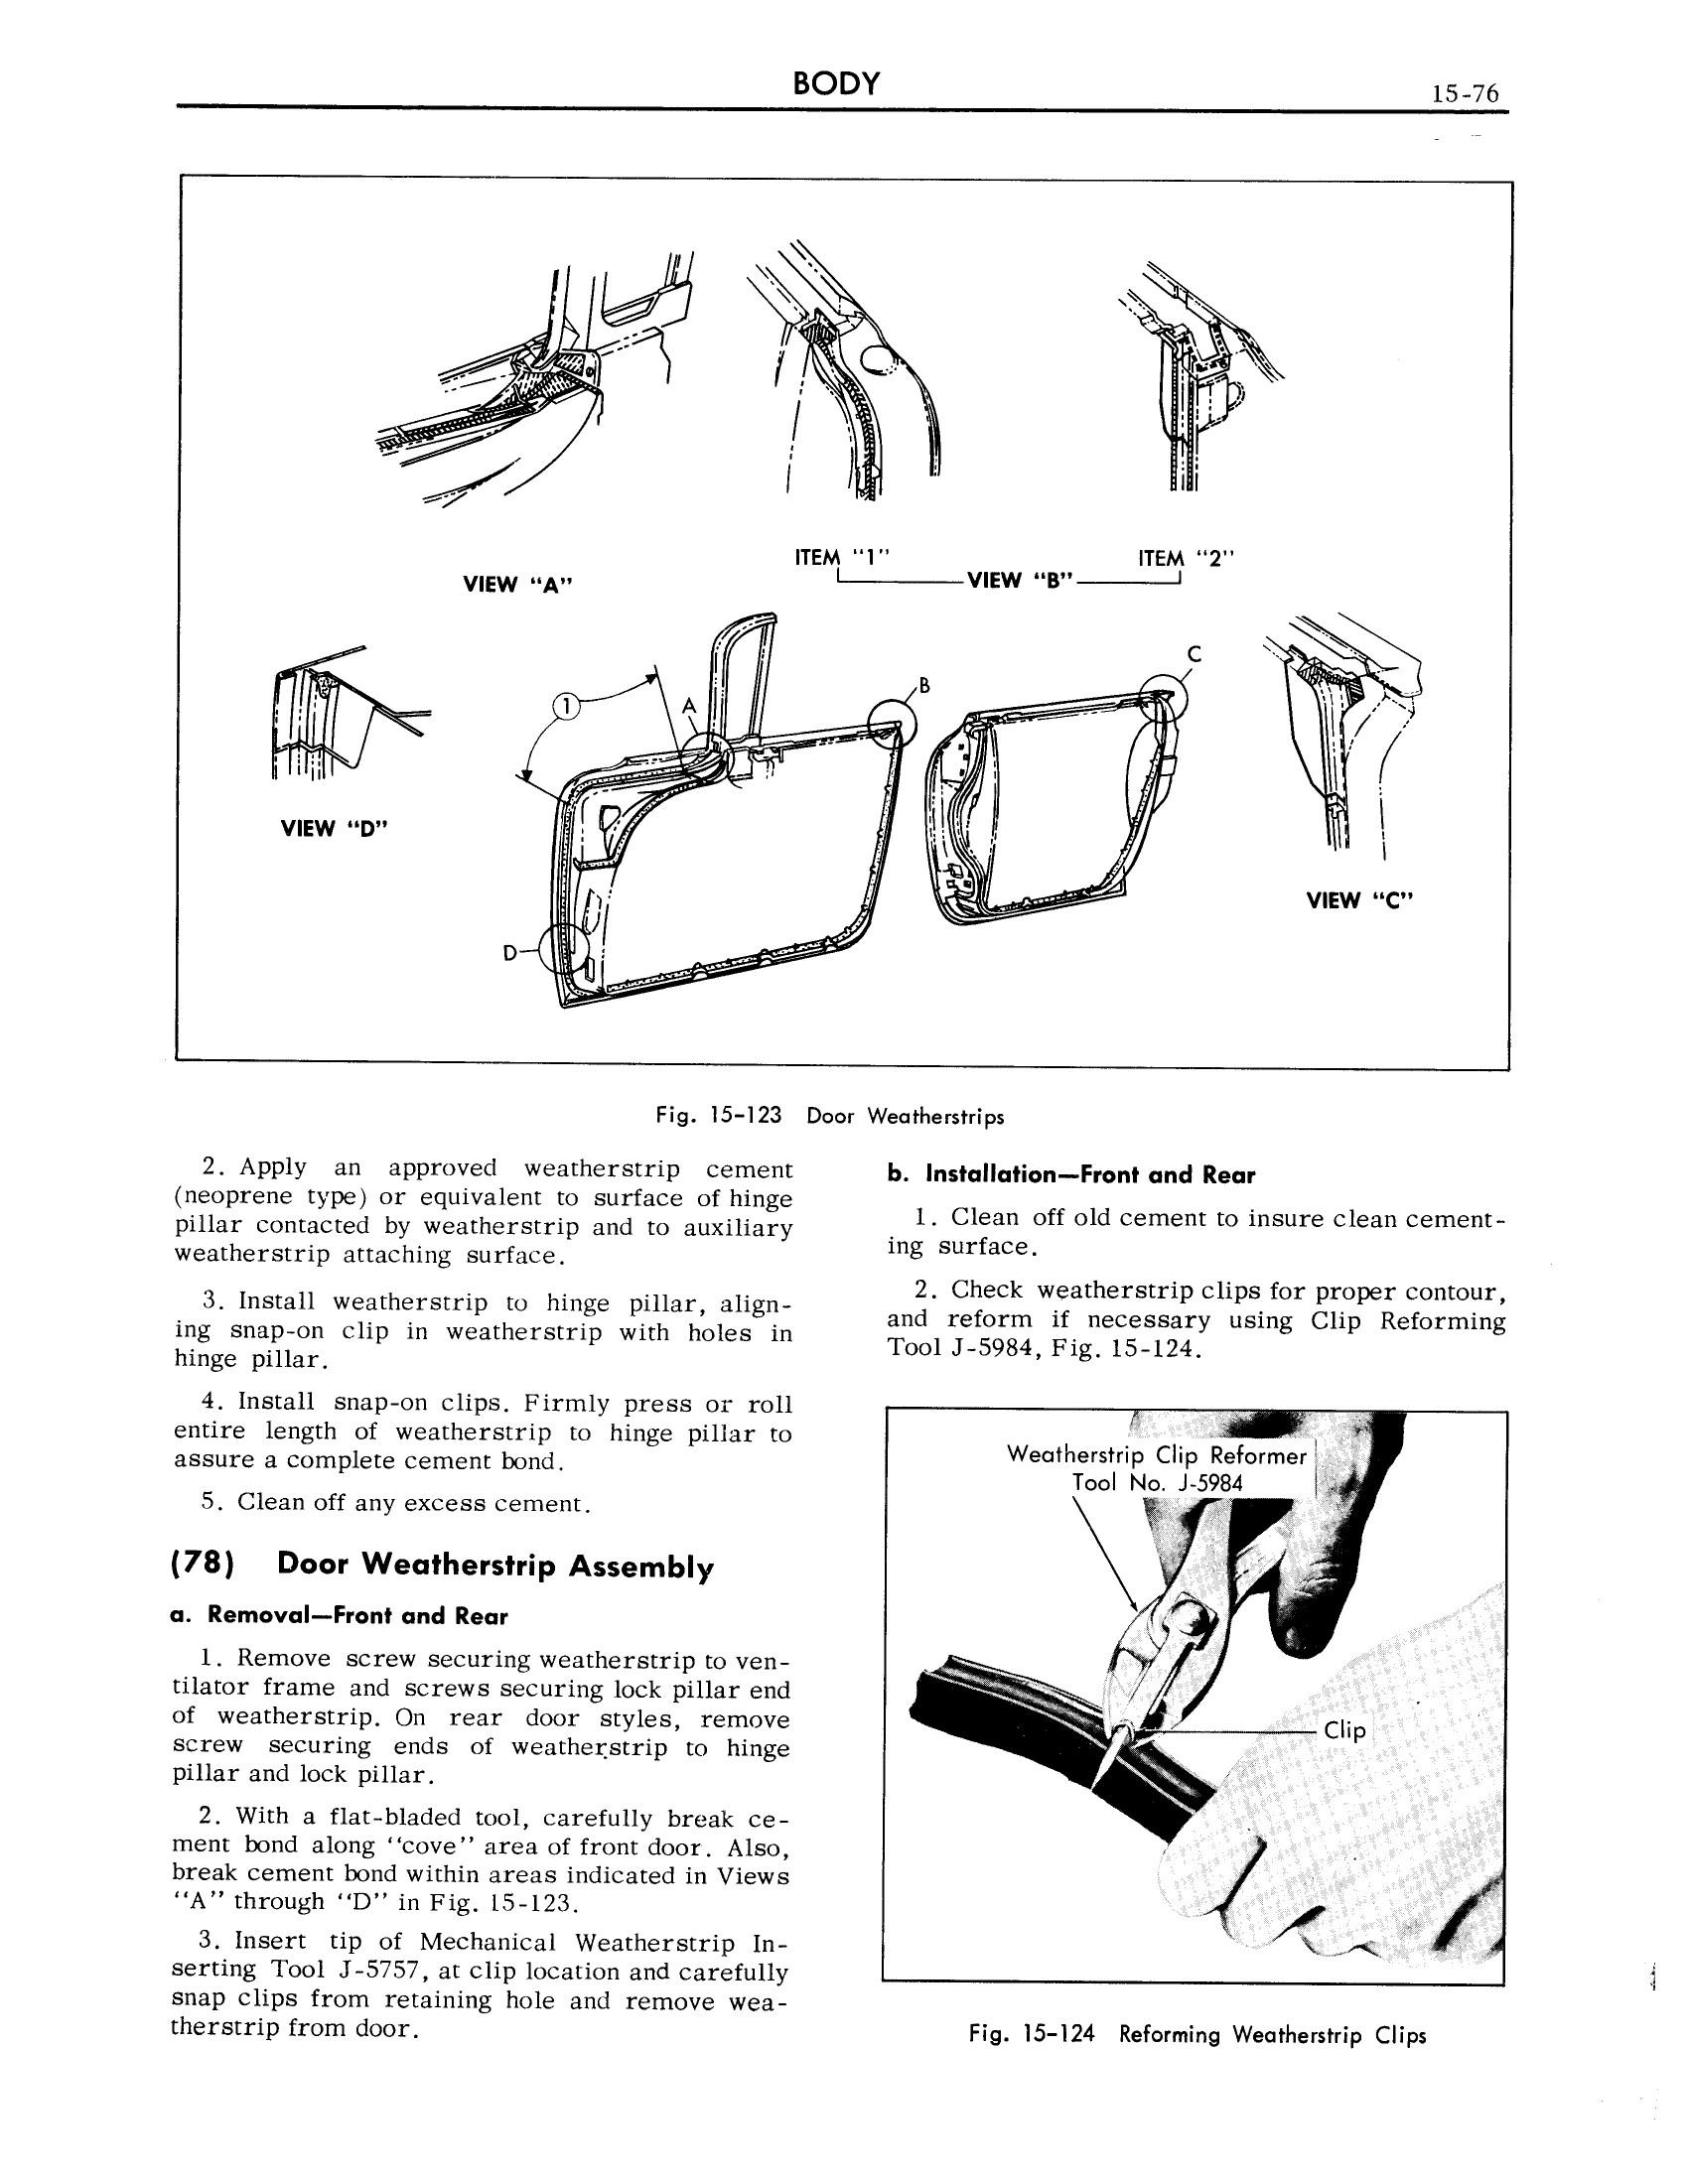 1959 Cadillac Shop Manual- Body Page 76 of 99